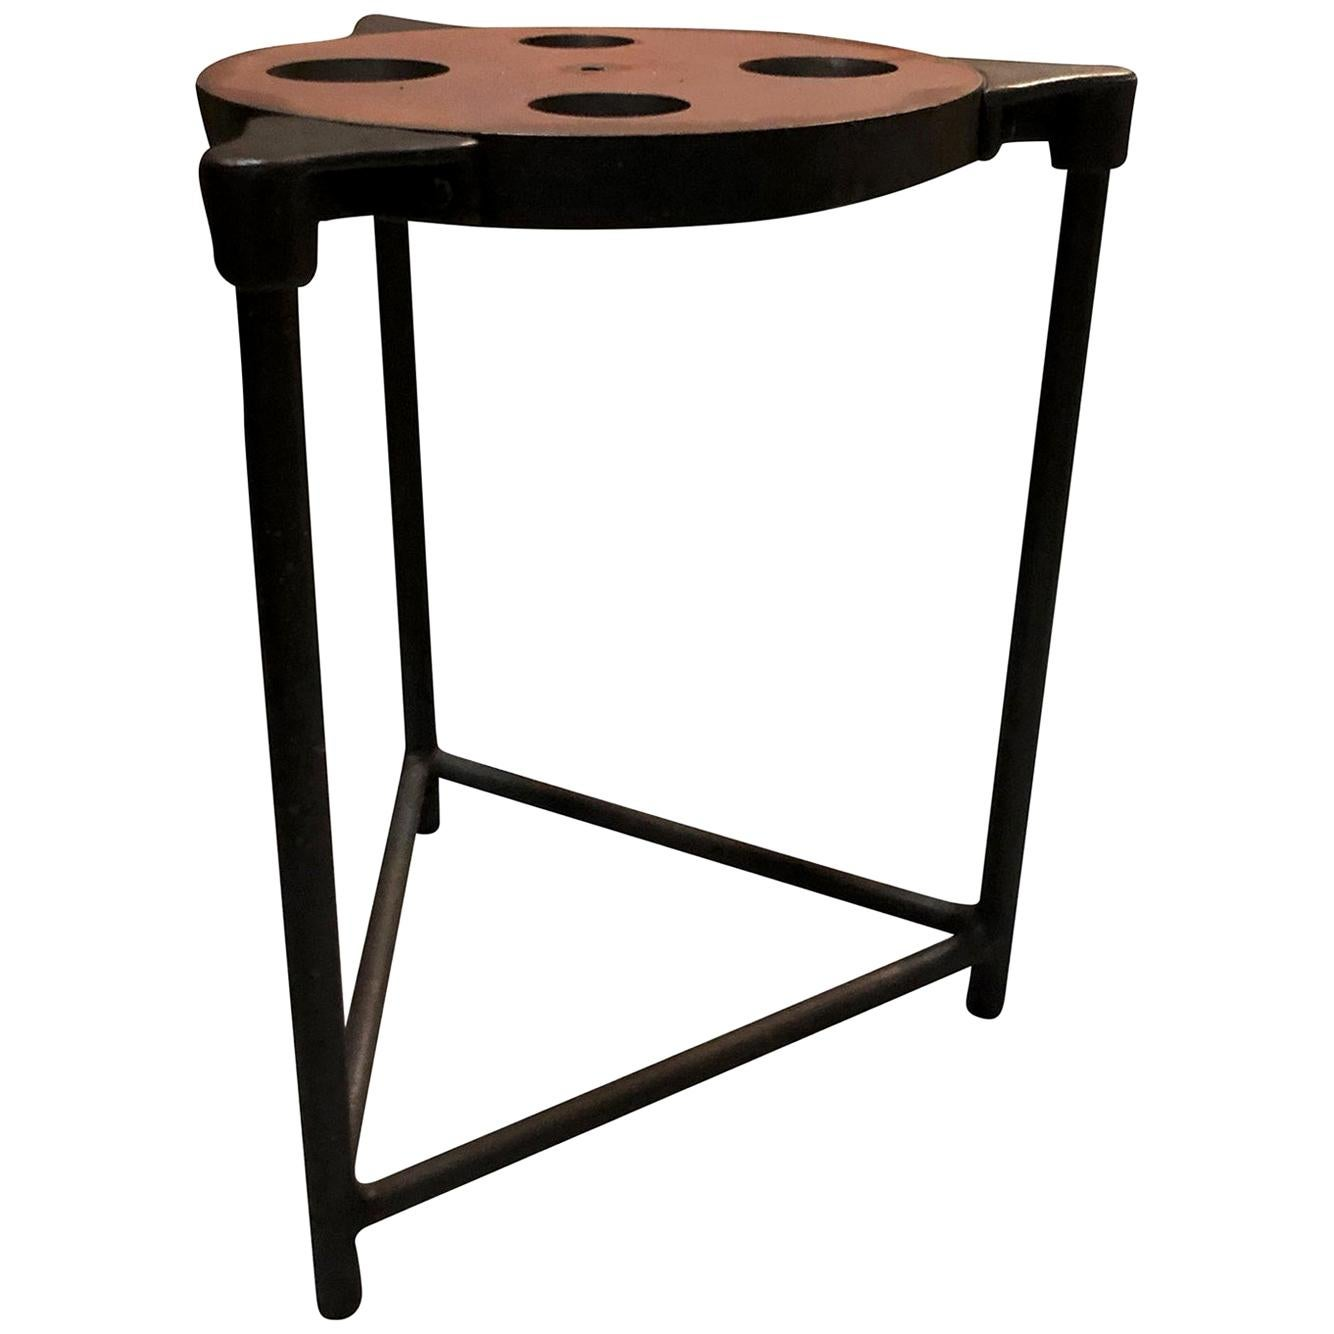 20th Century American Vintage Industrial Machinist Table, Metal Side Table